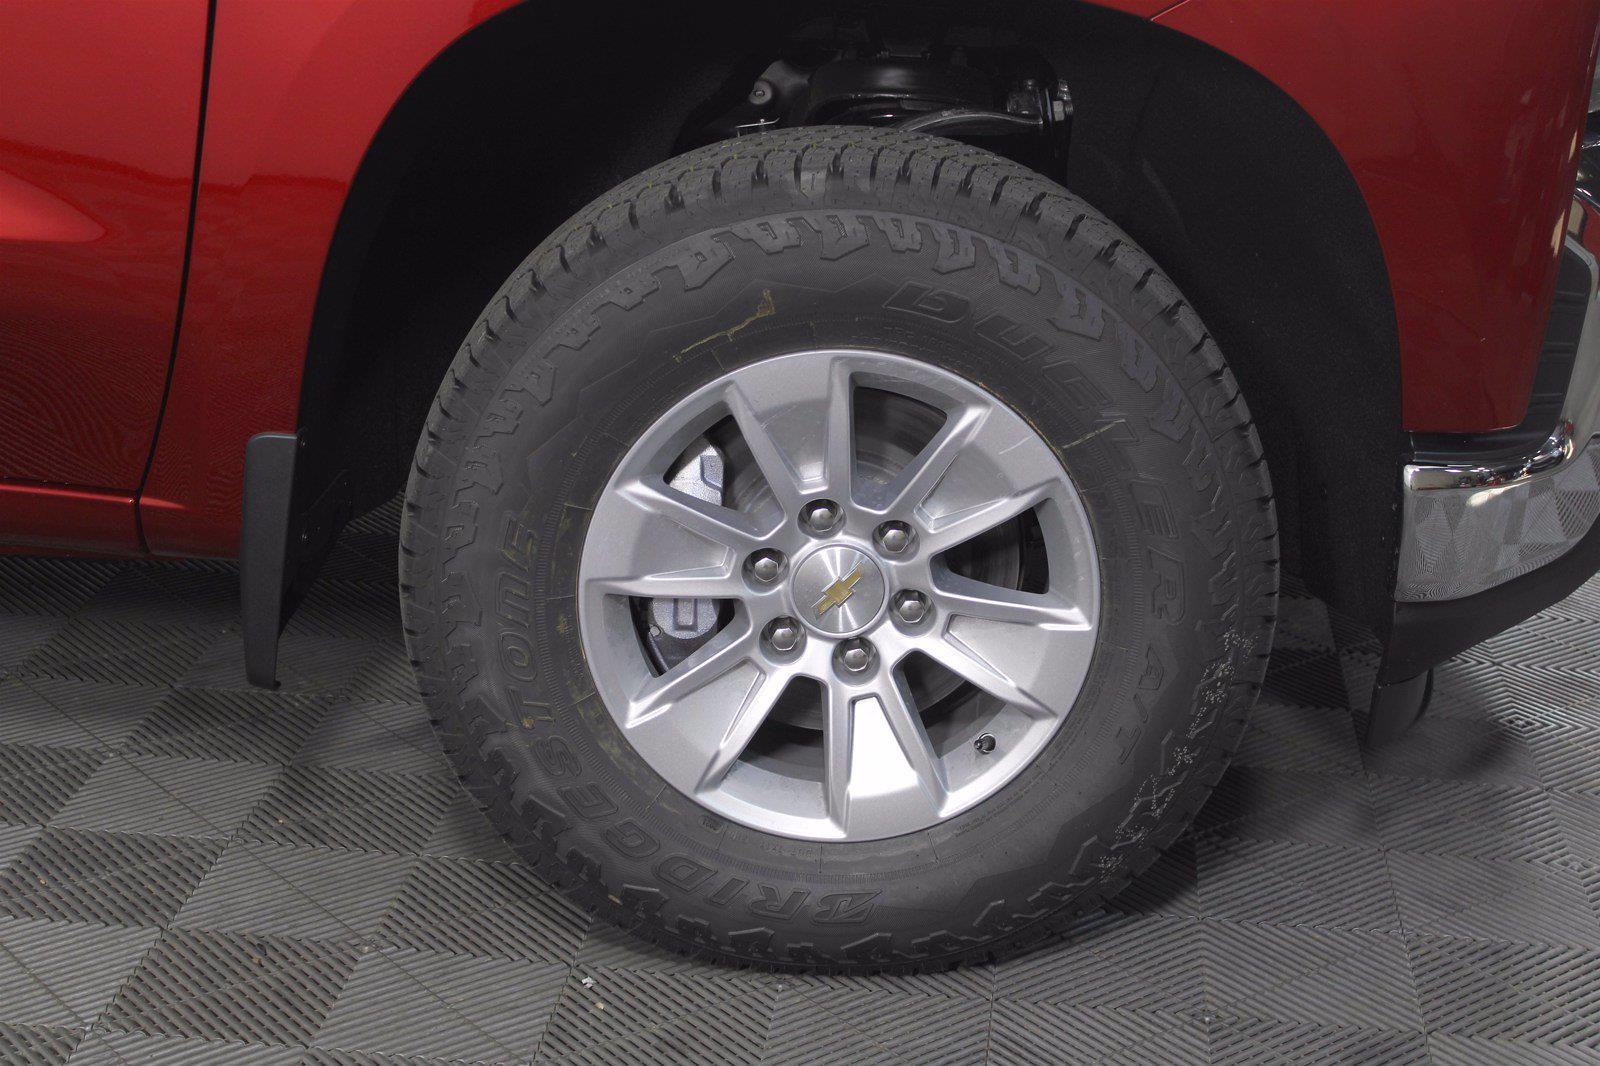 2021 Chevrolet Silverado 1500 Crew Cab 4x4, Pickup #D111130 - photo 6